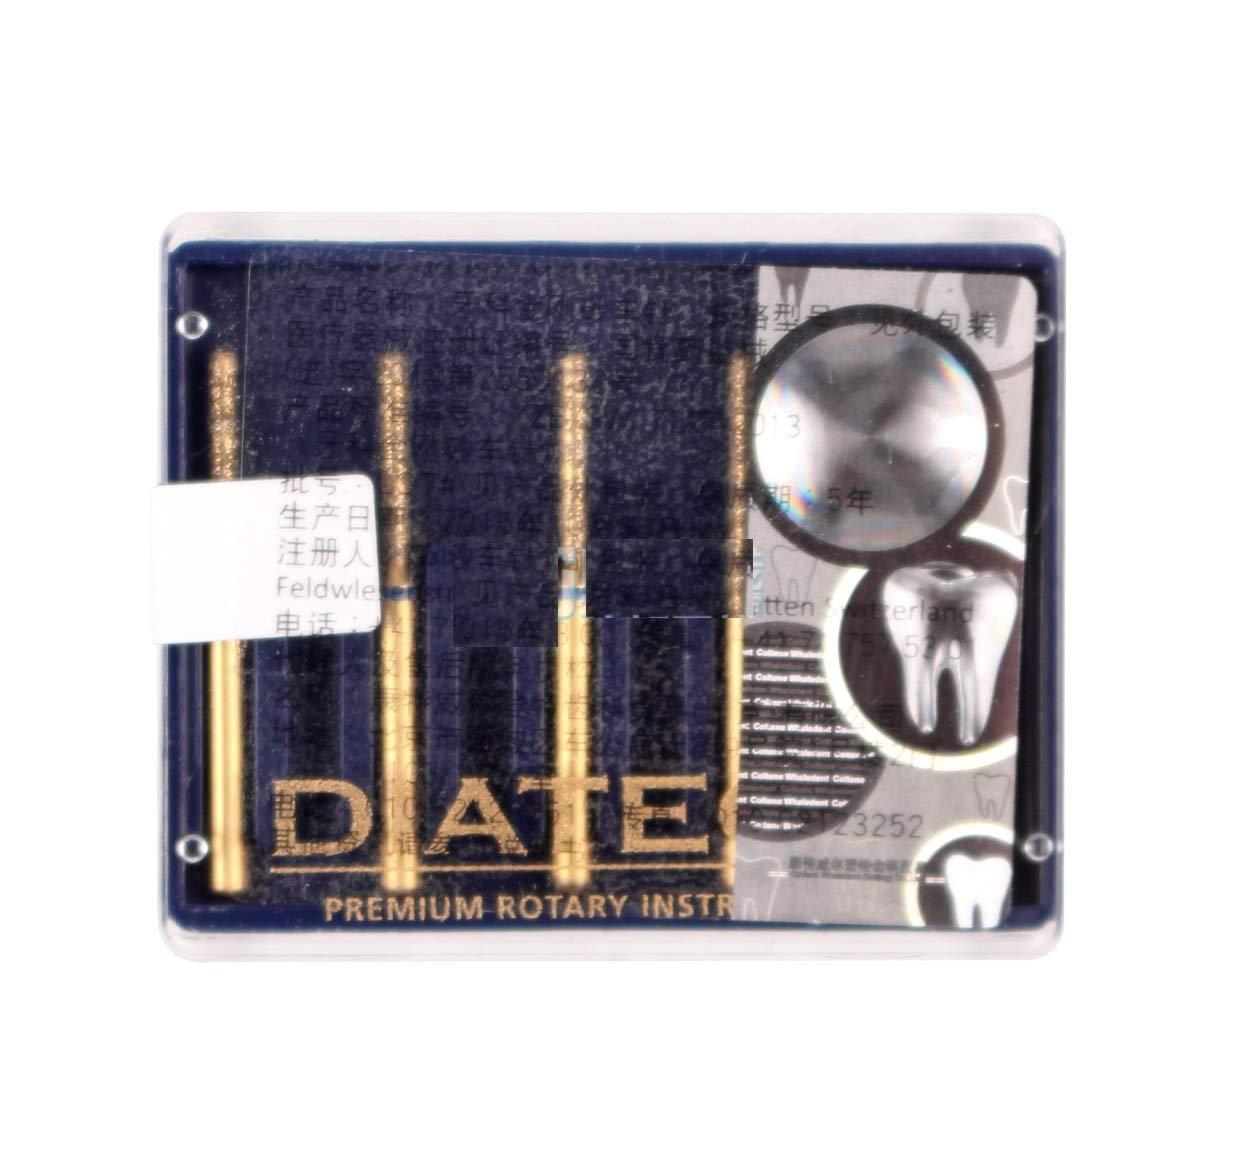 Dental COLTENE Diatech carborundum needle kit 881-012-8ML